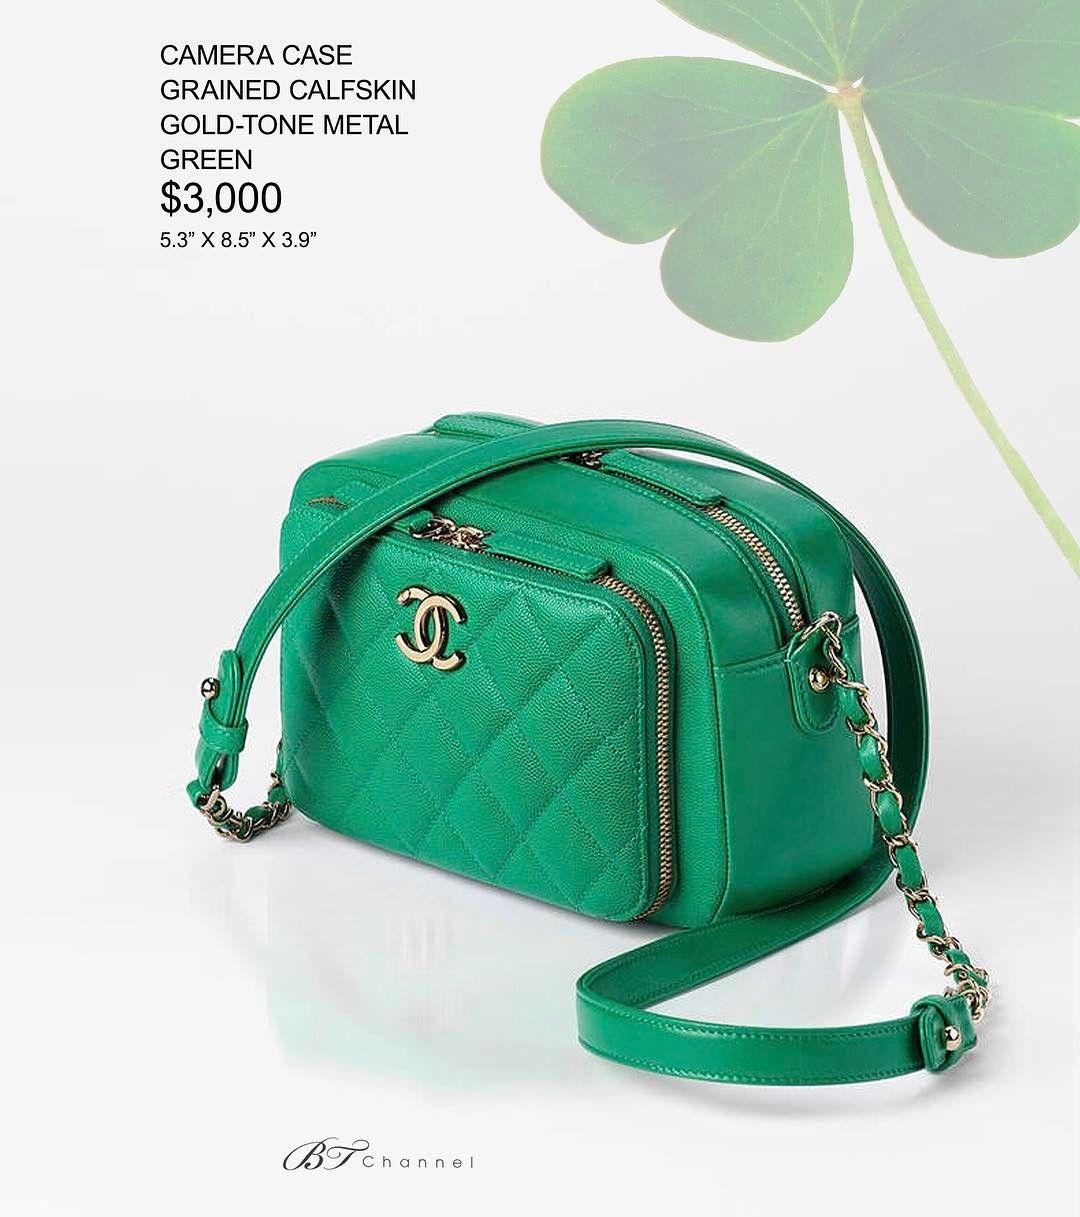 3f4b0197ff60 Chanel Chevron Lambskin Chain Drawstring Bag A91885 Black 2017 ...